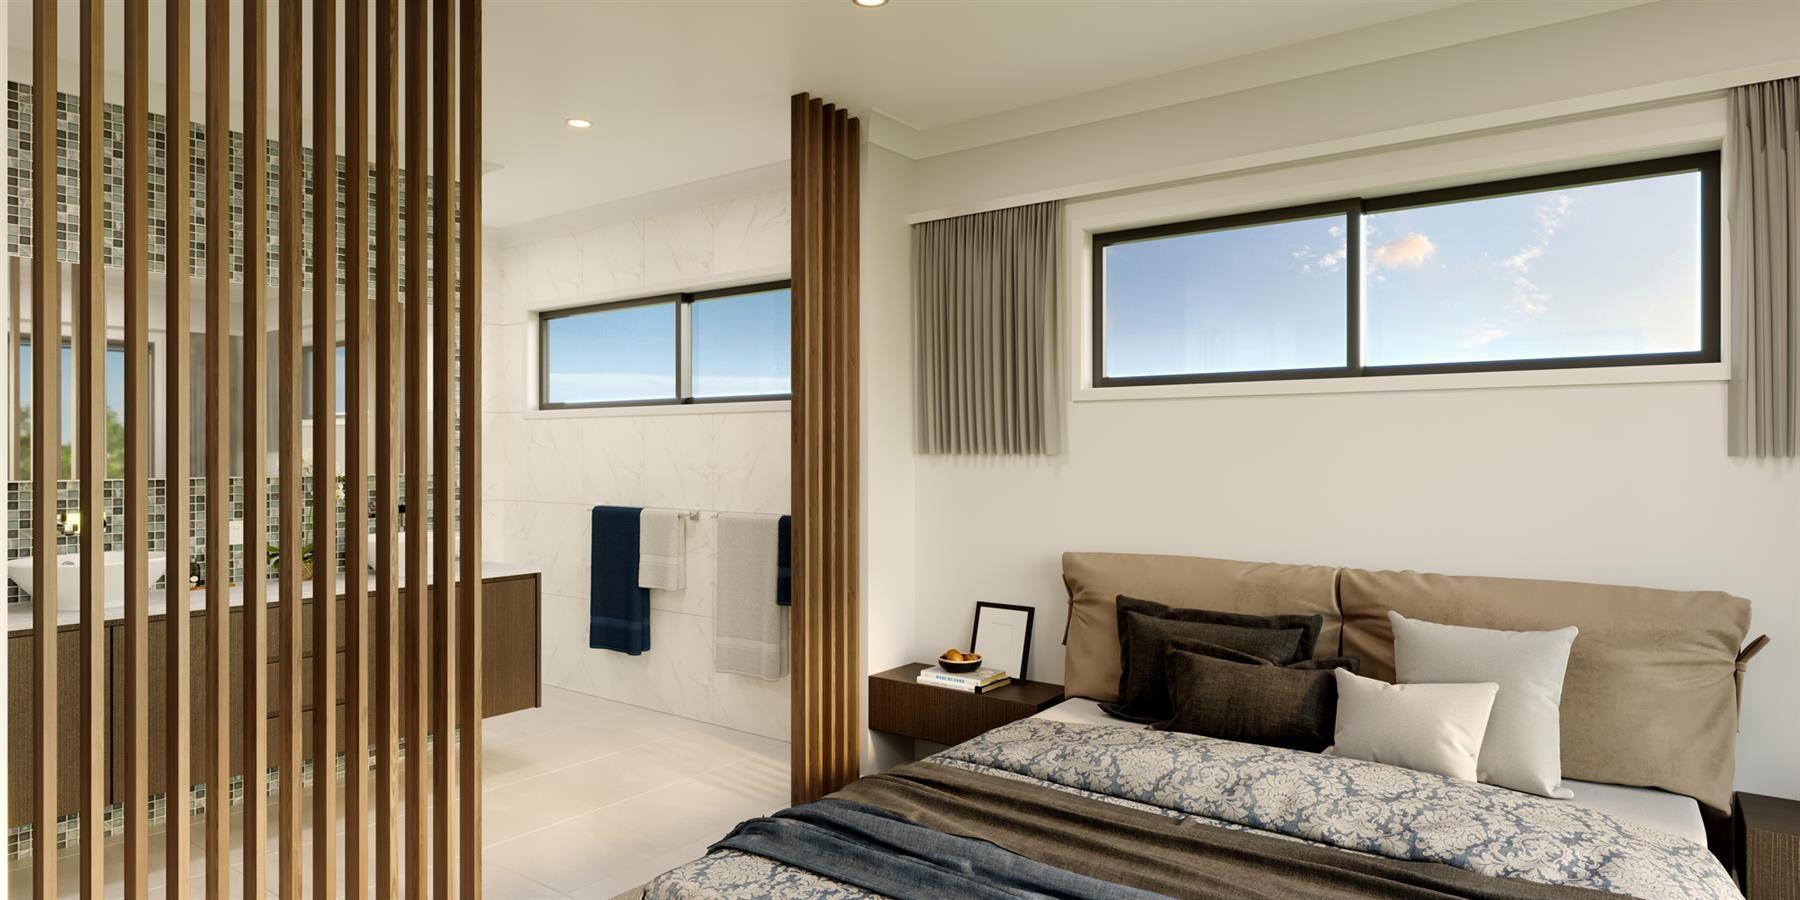 Lot 55 Lophostemon Drive, Boambee NSW 2450, Image 2